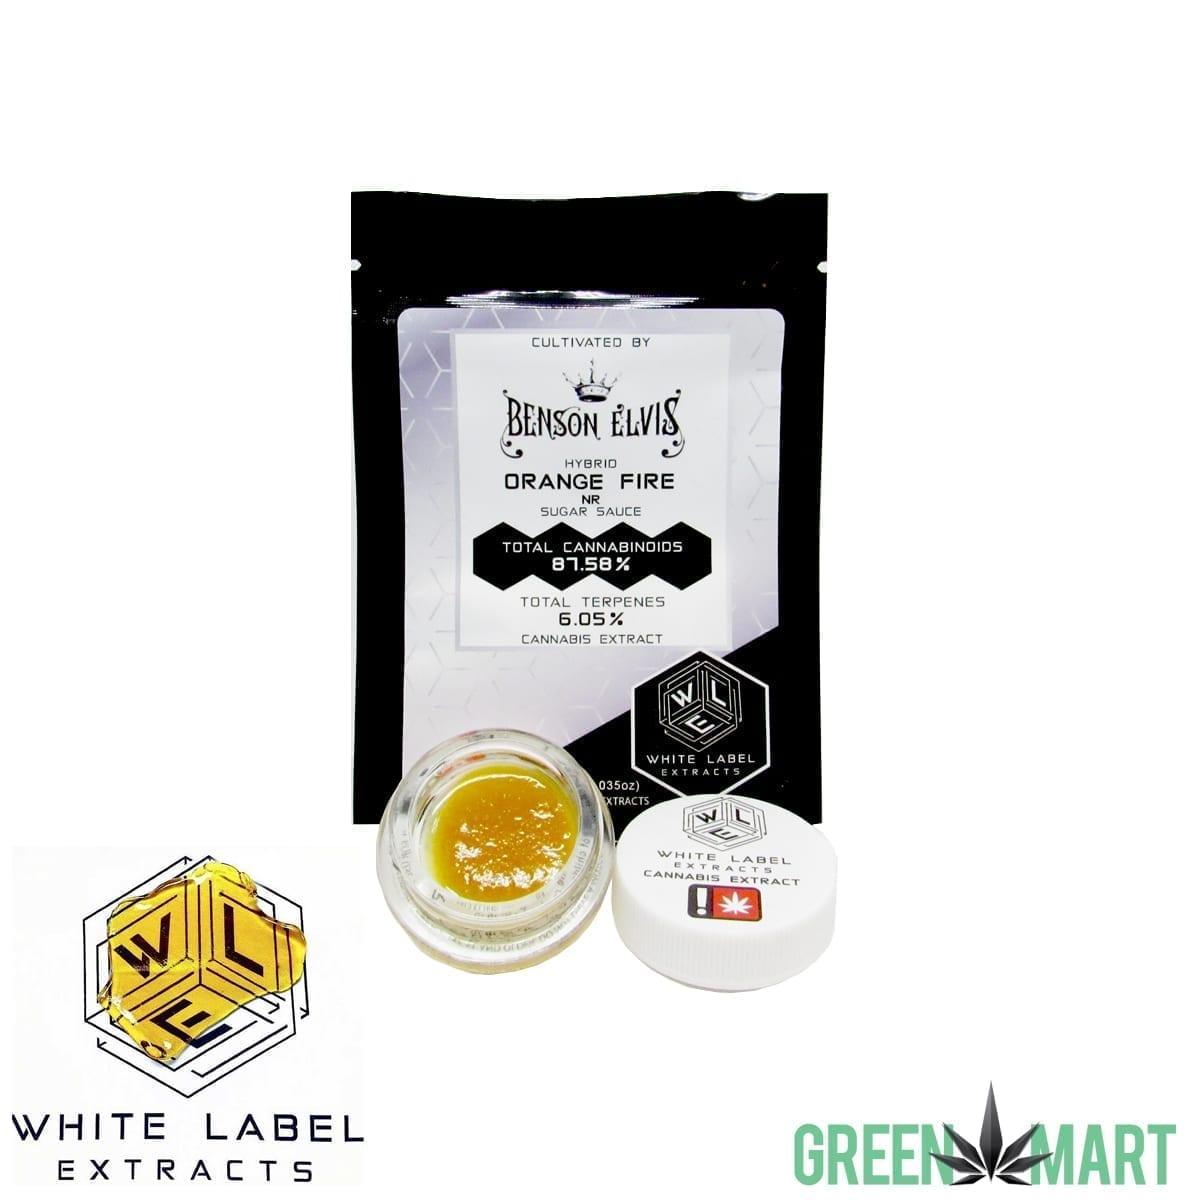 White Label Extracts - Orange Fire Sugar Sauce